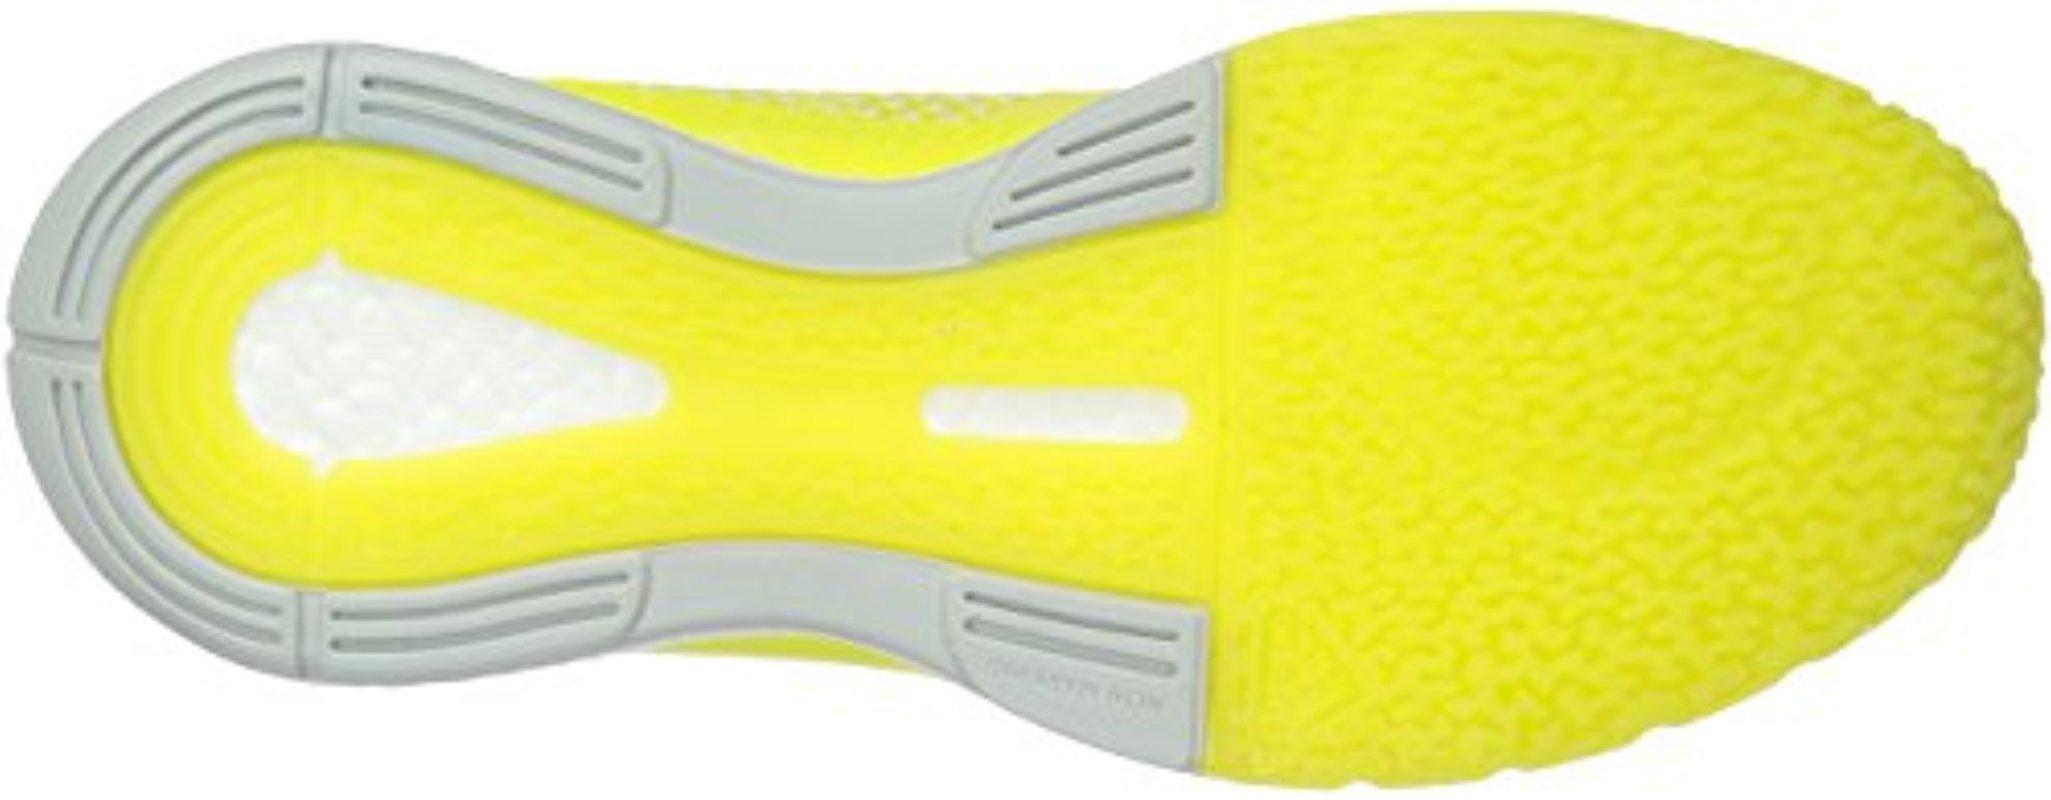 super popular ea606 2a8ac Lyst - adidas Crazyflight X 2 Mid Volleyball Shoe in Yellow